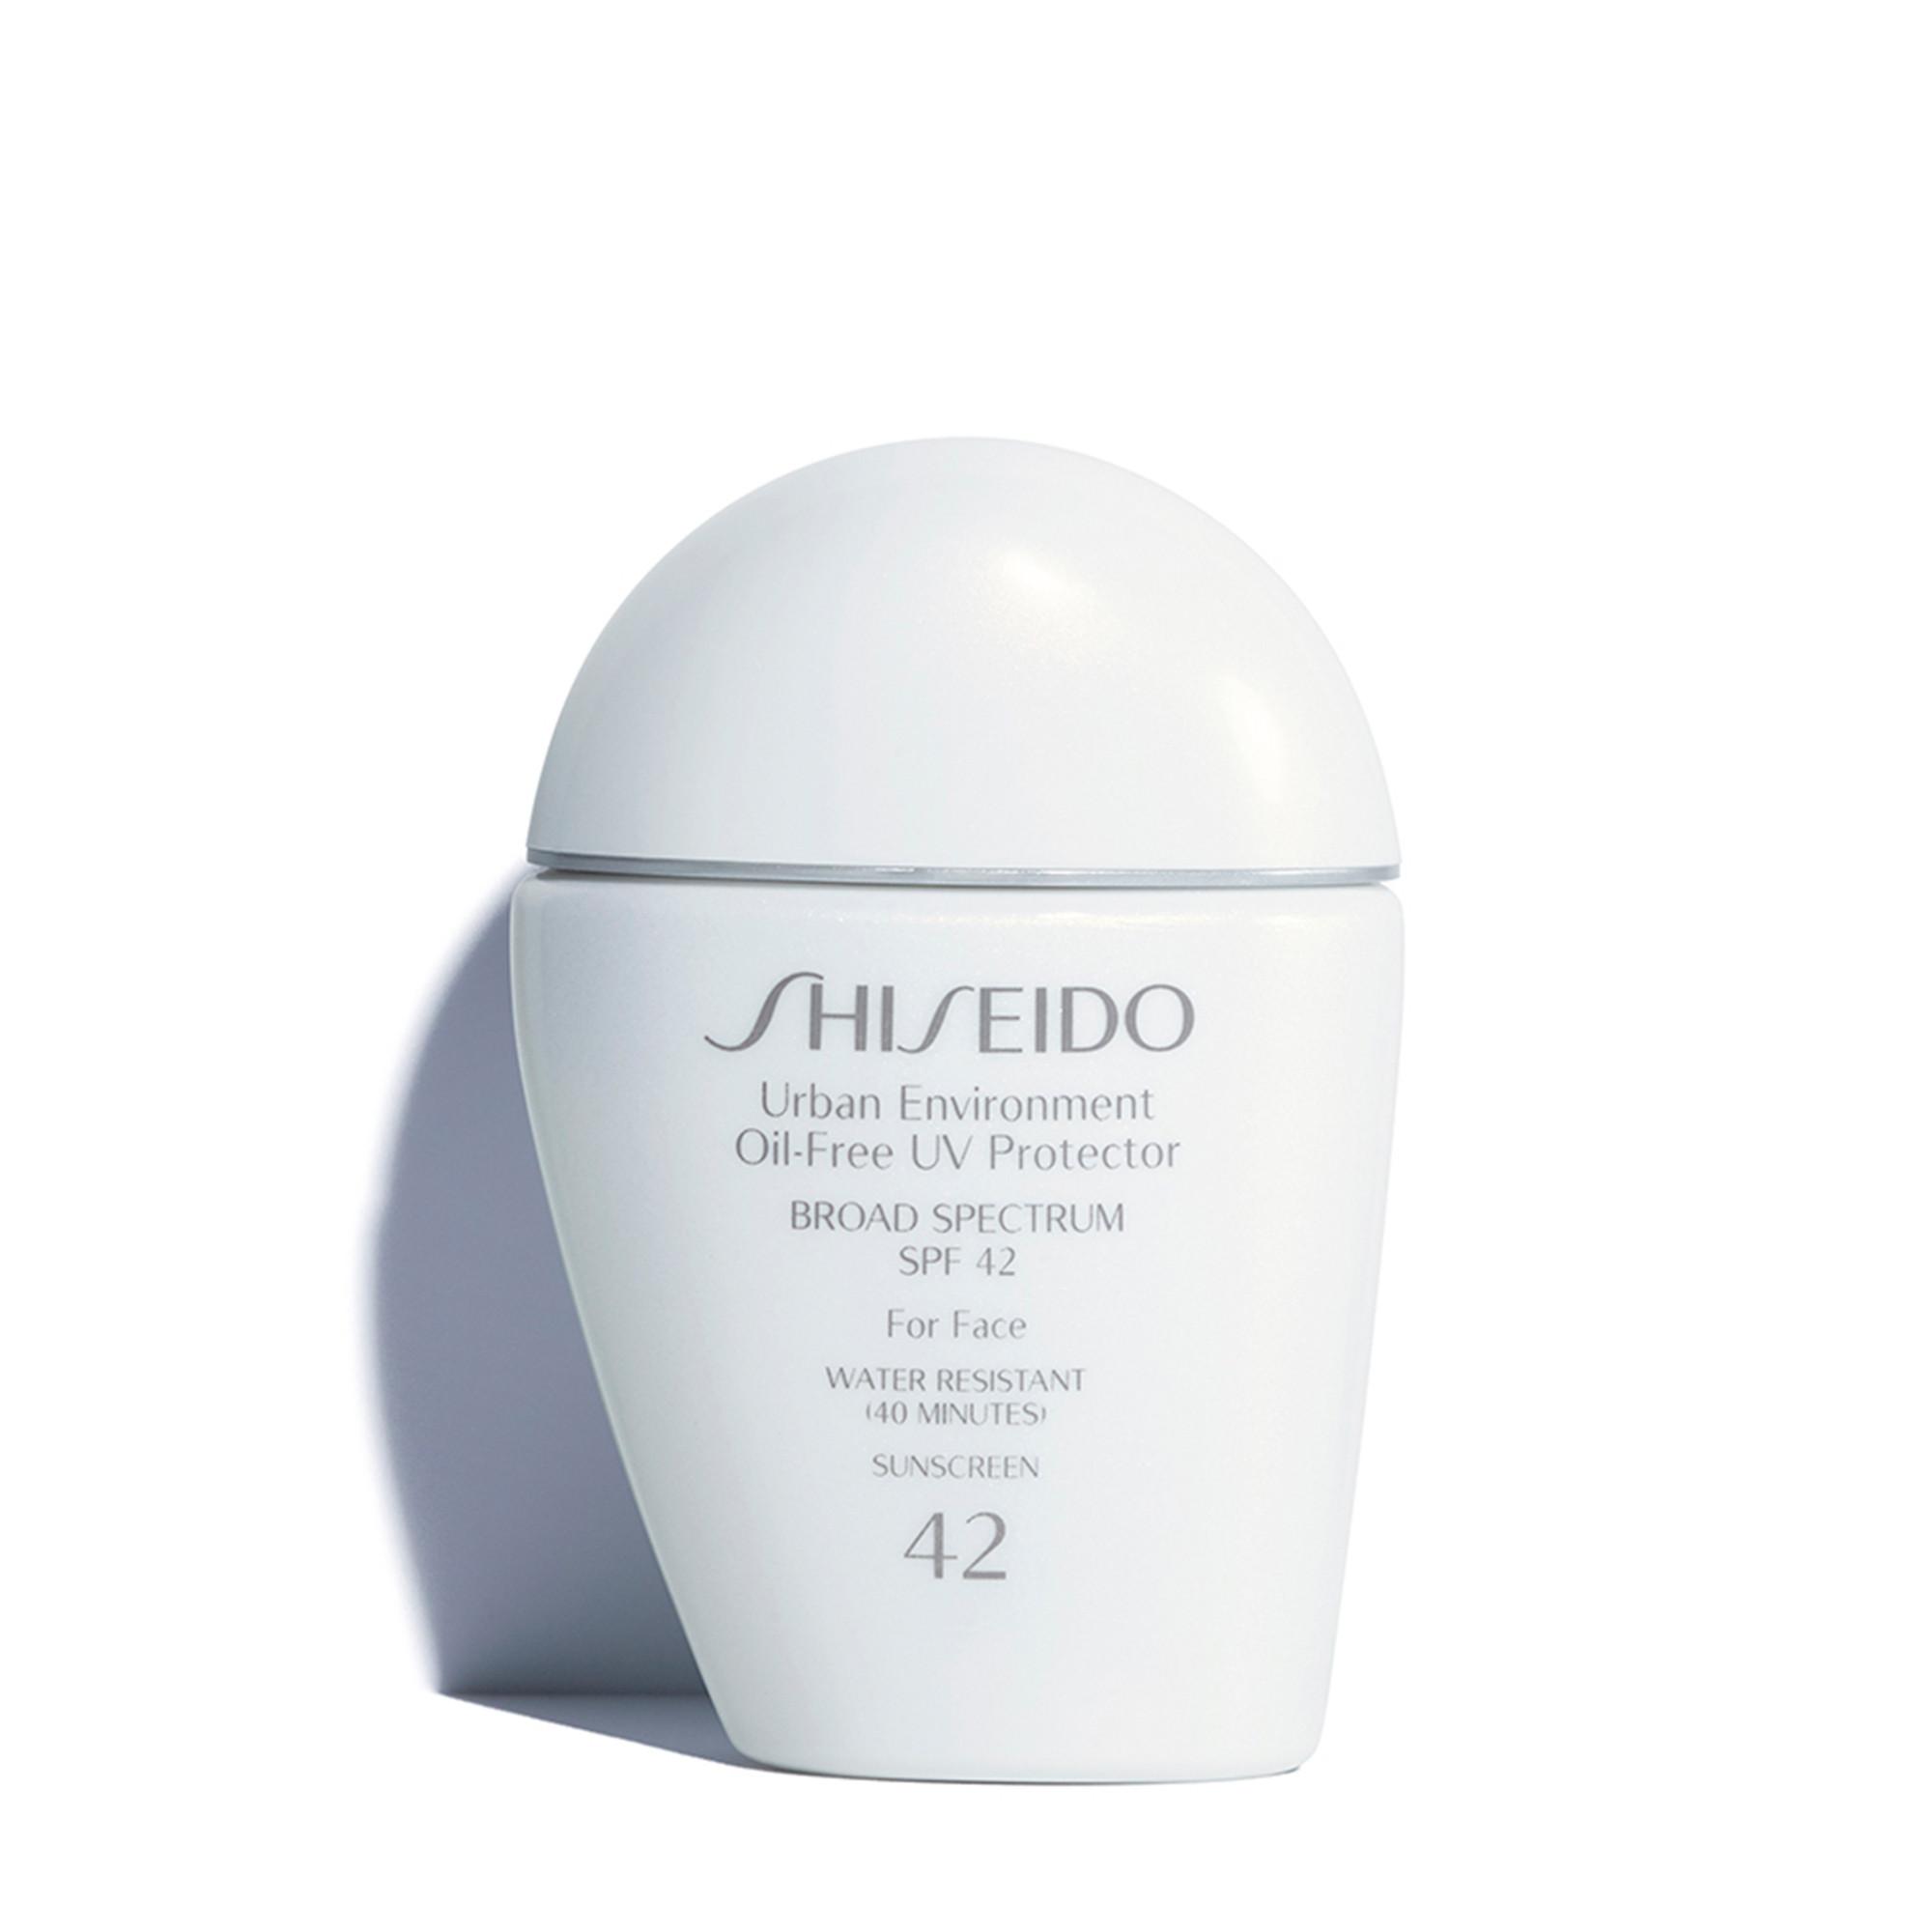 Spf 42 Oil Free Sunscreen Urban Environment Uv Protector Shiseido